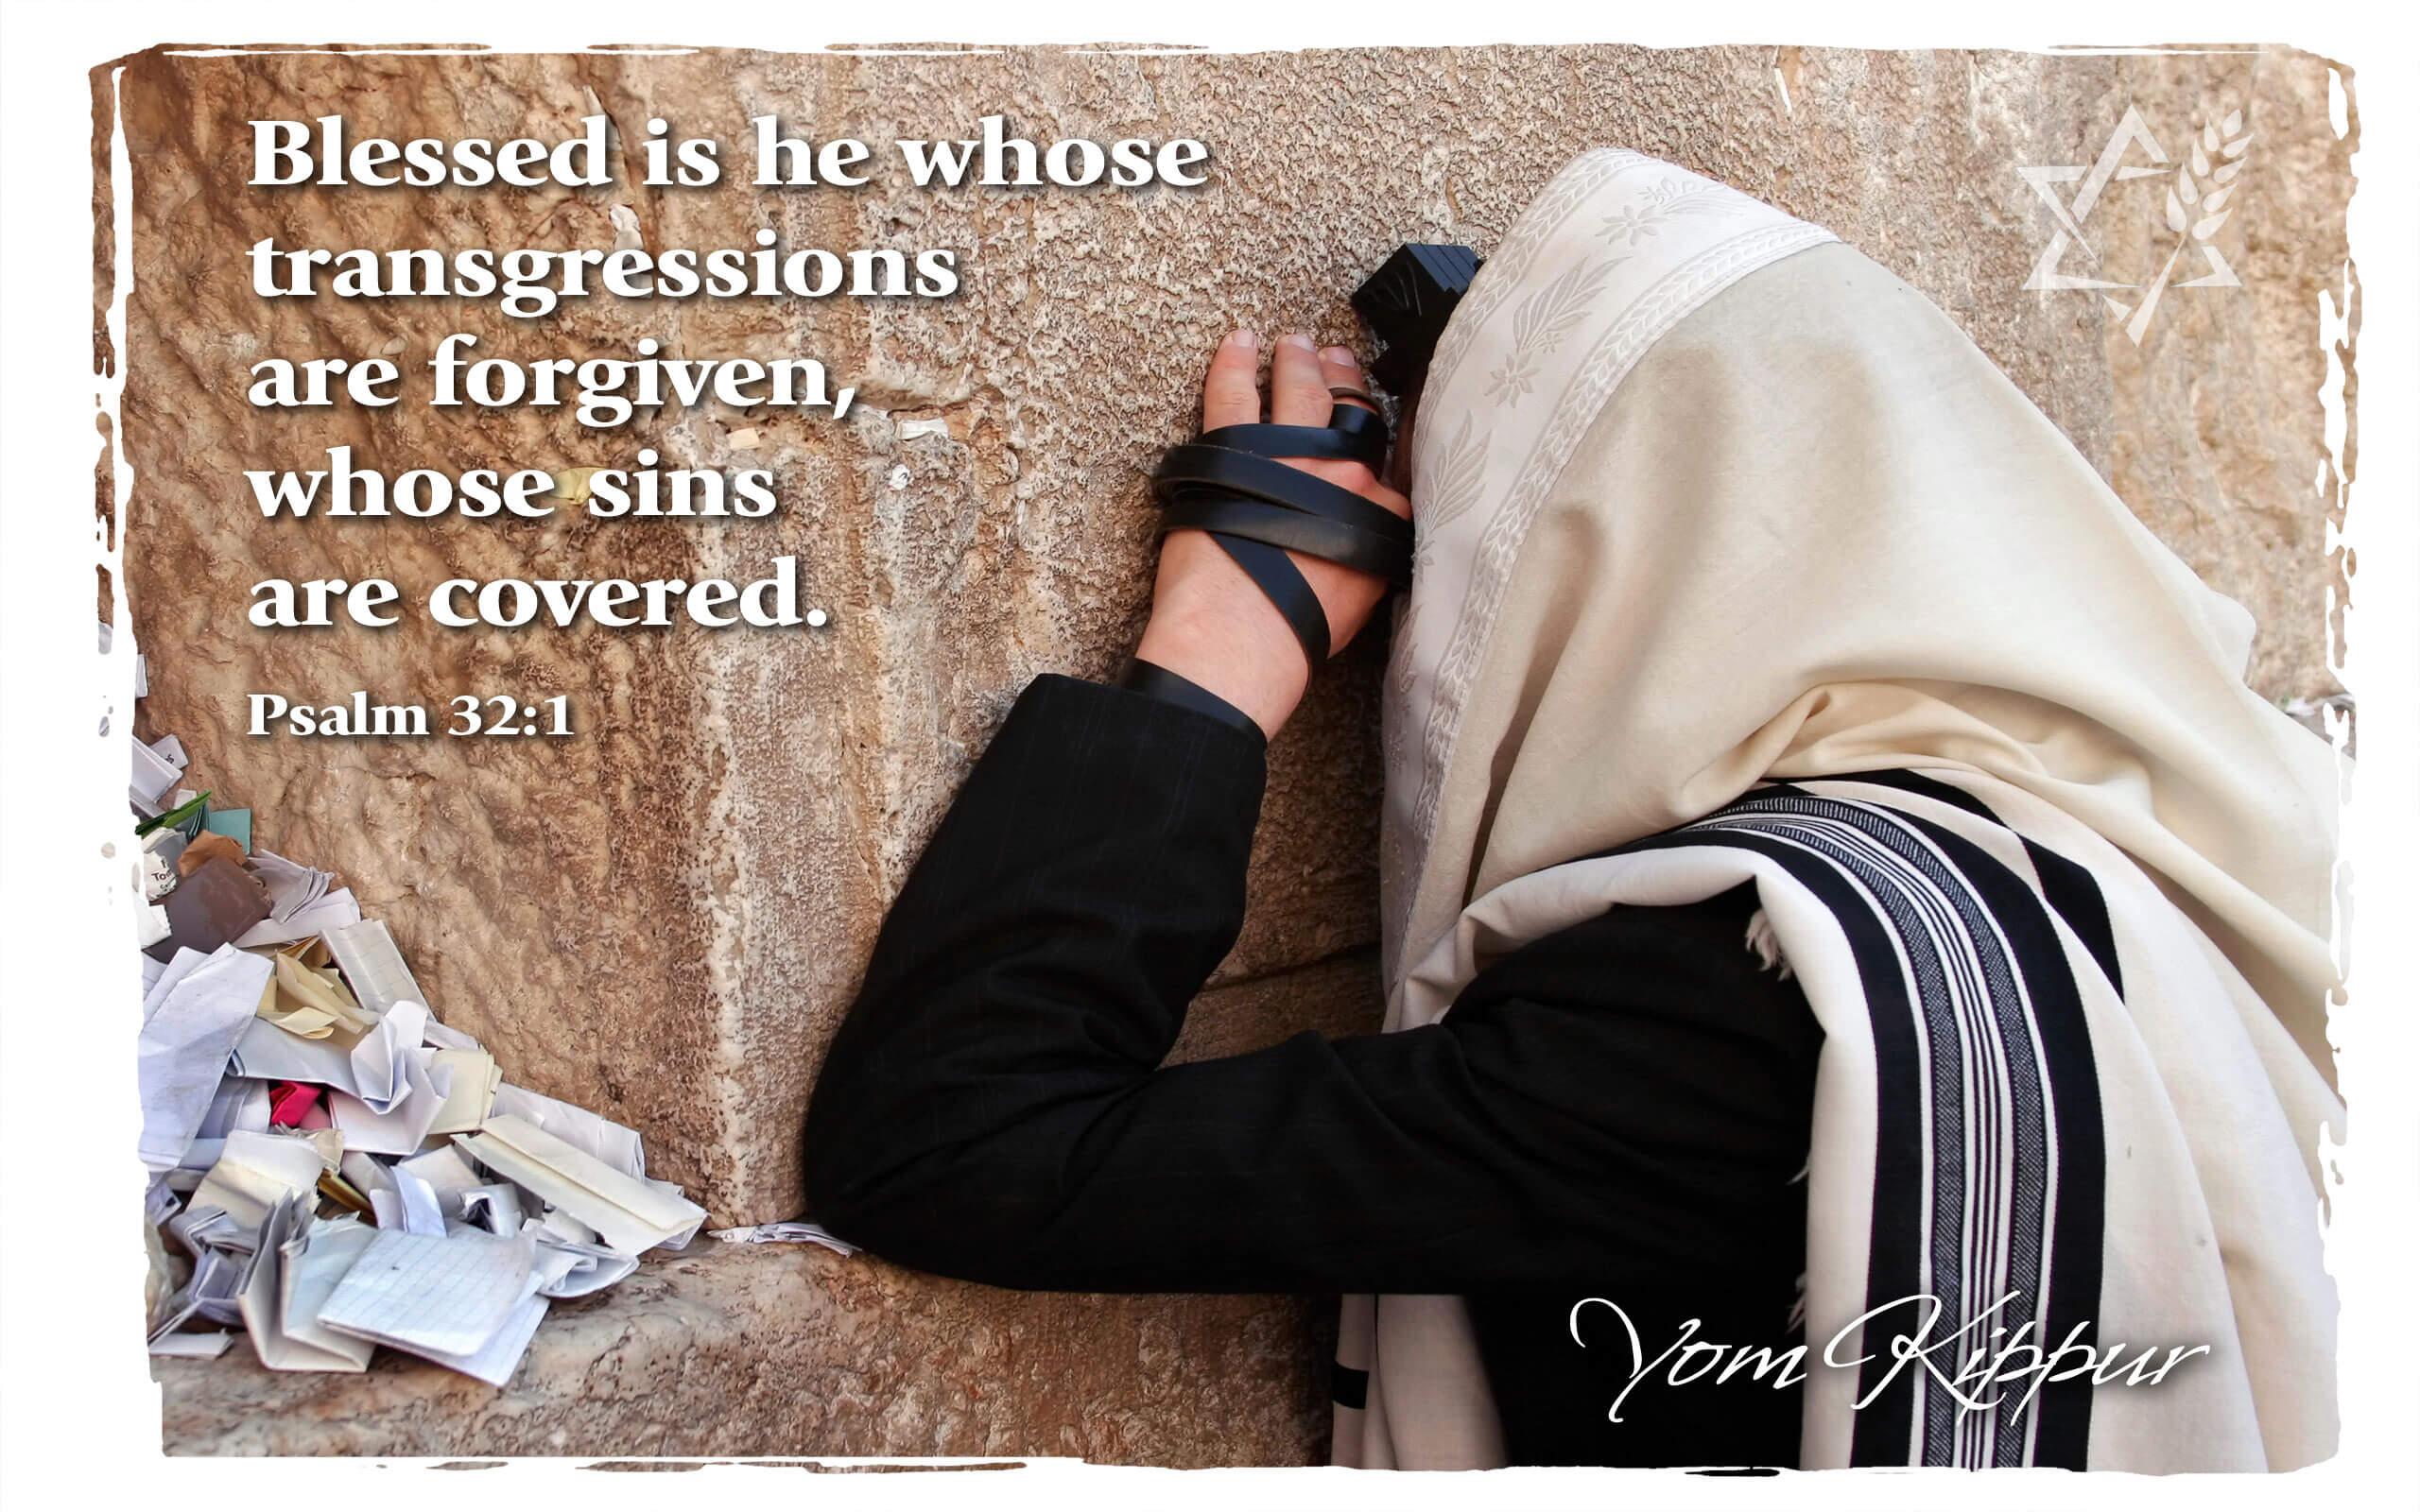 Yom Kippur 2015 Quotes